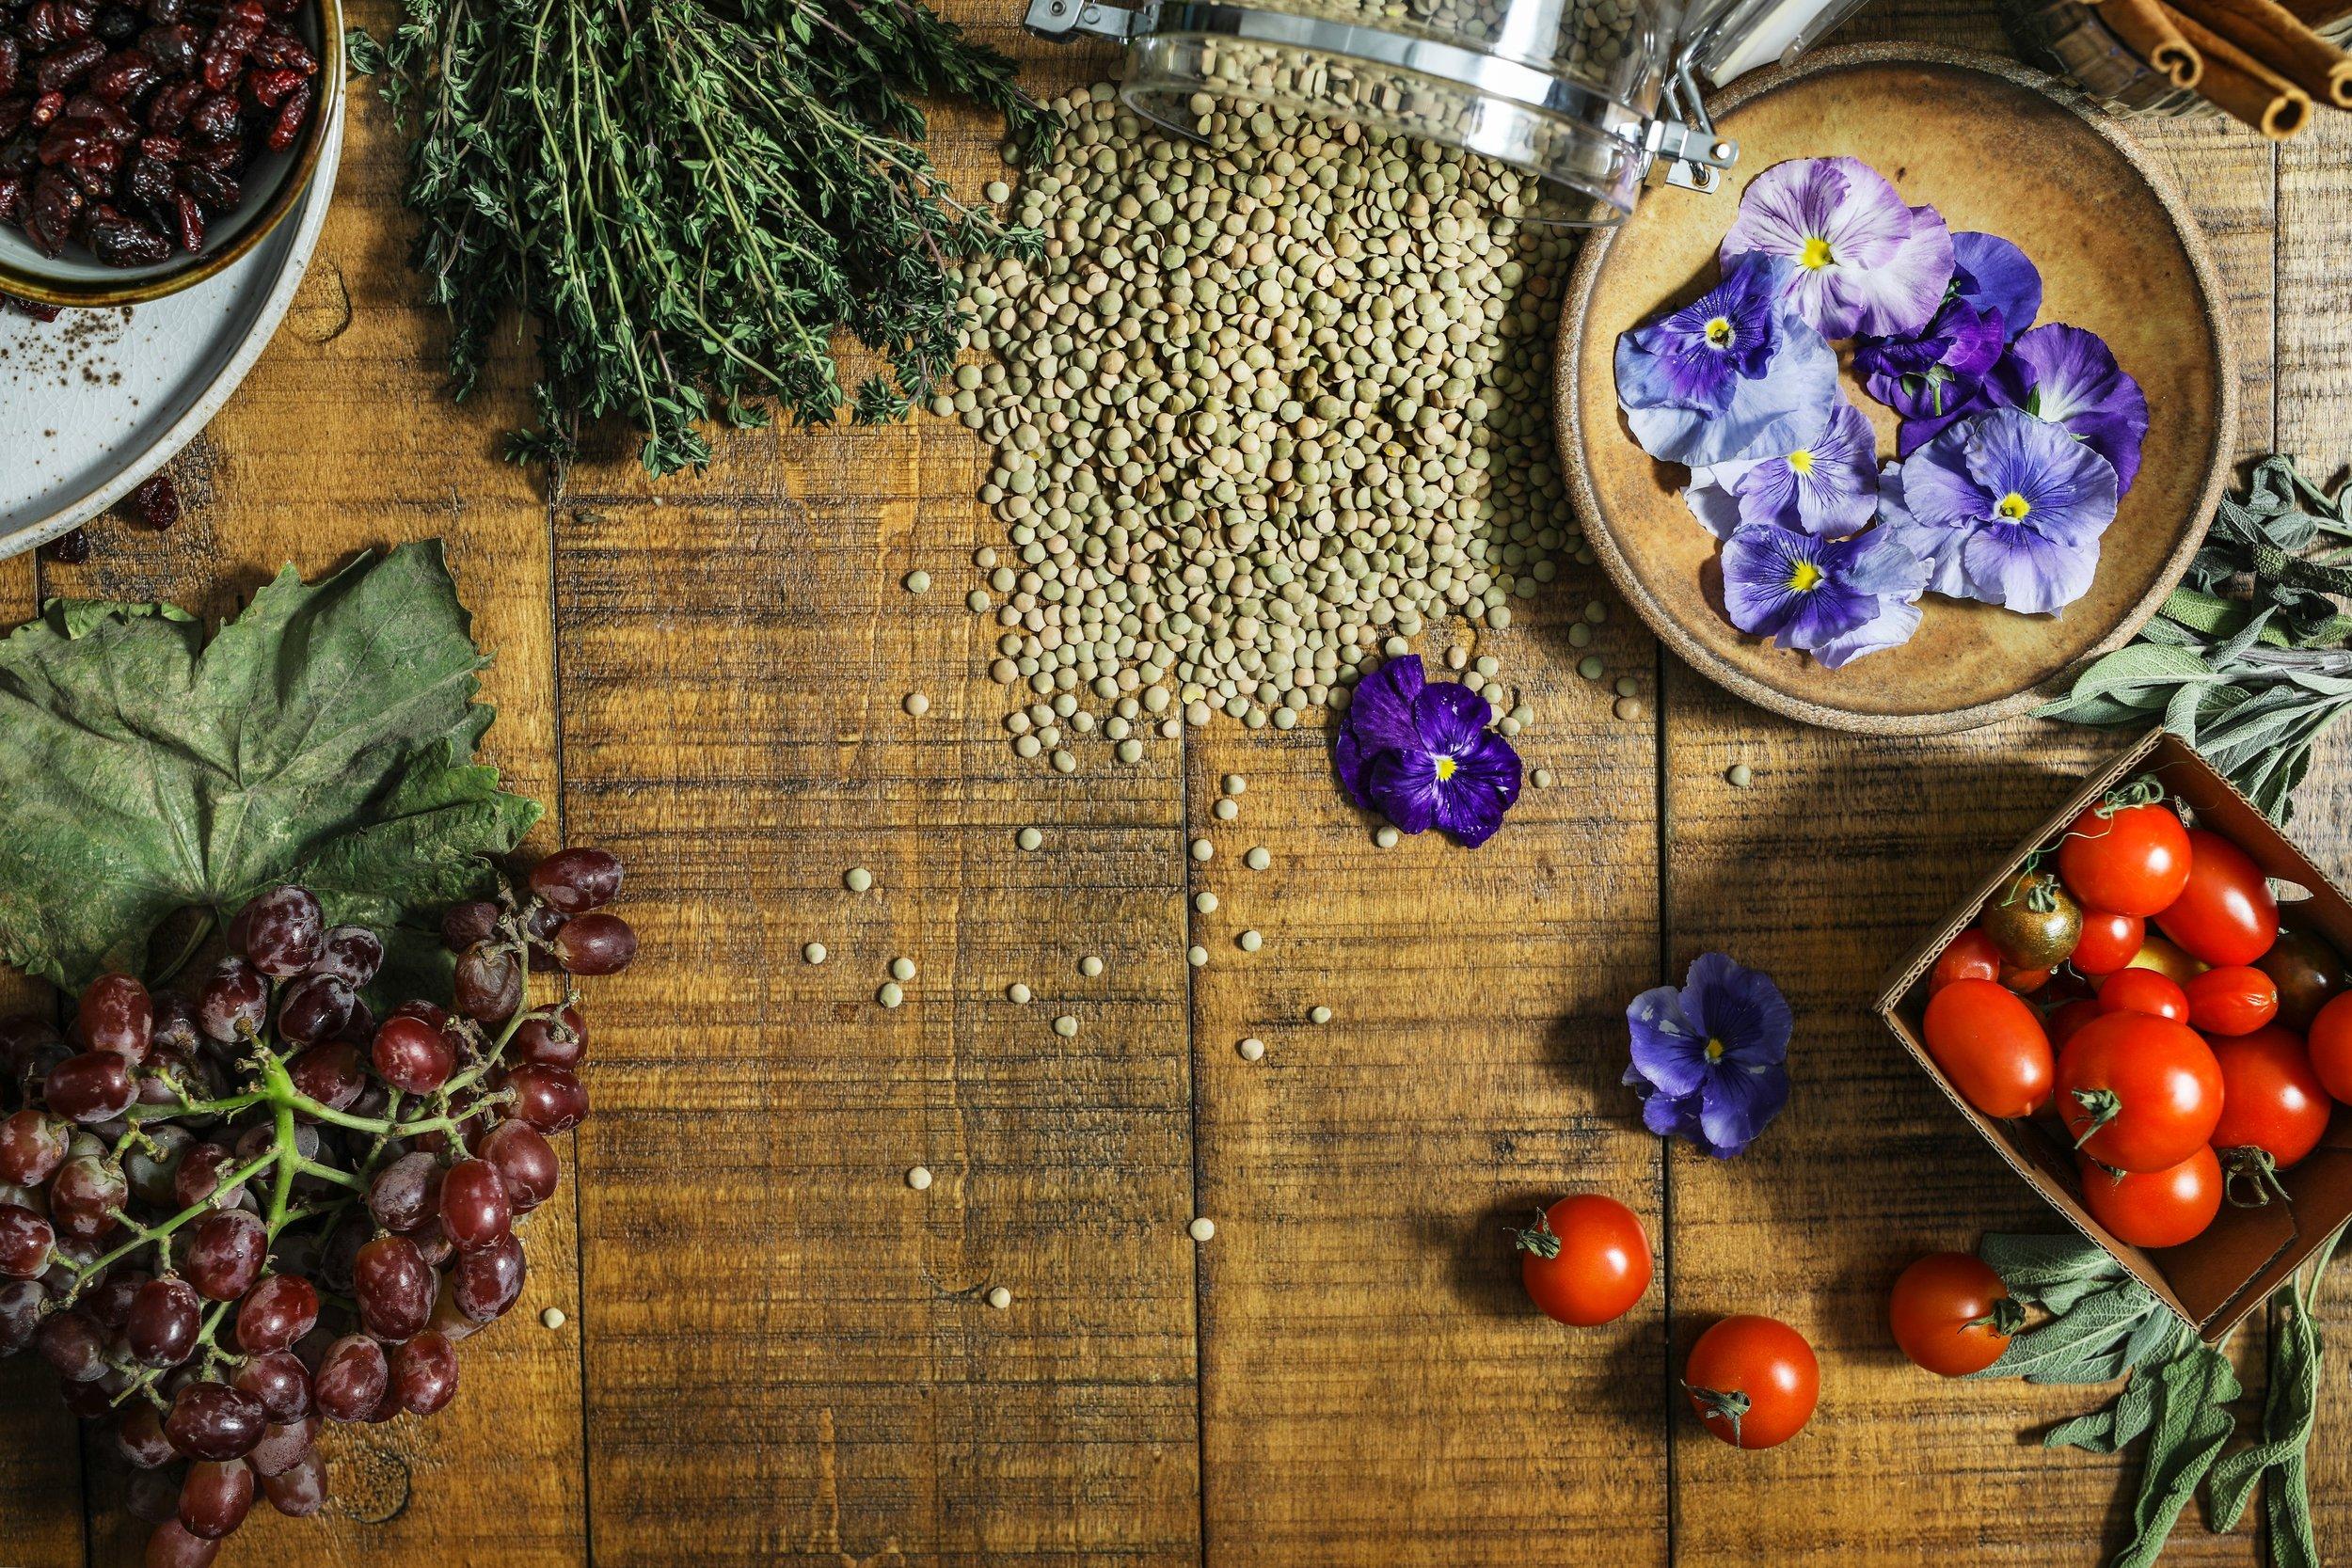 tomatoes lentils herbs nutrigenomics